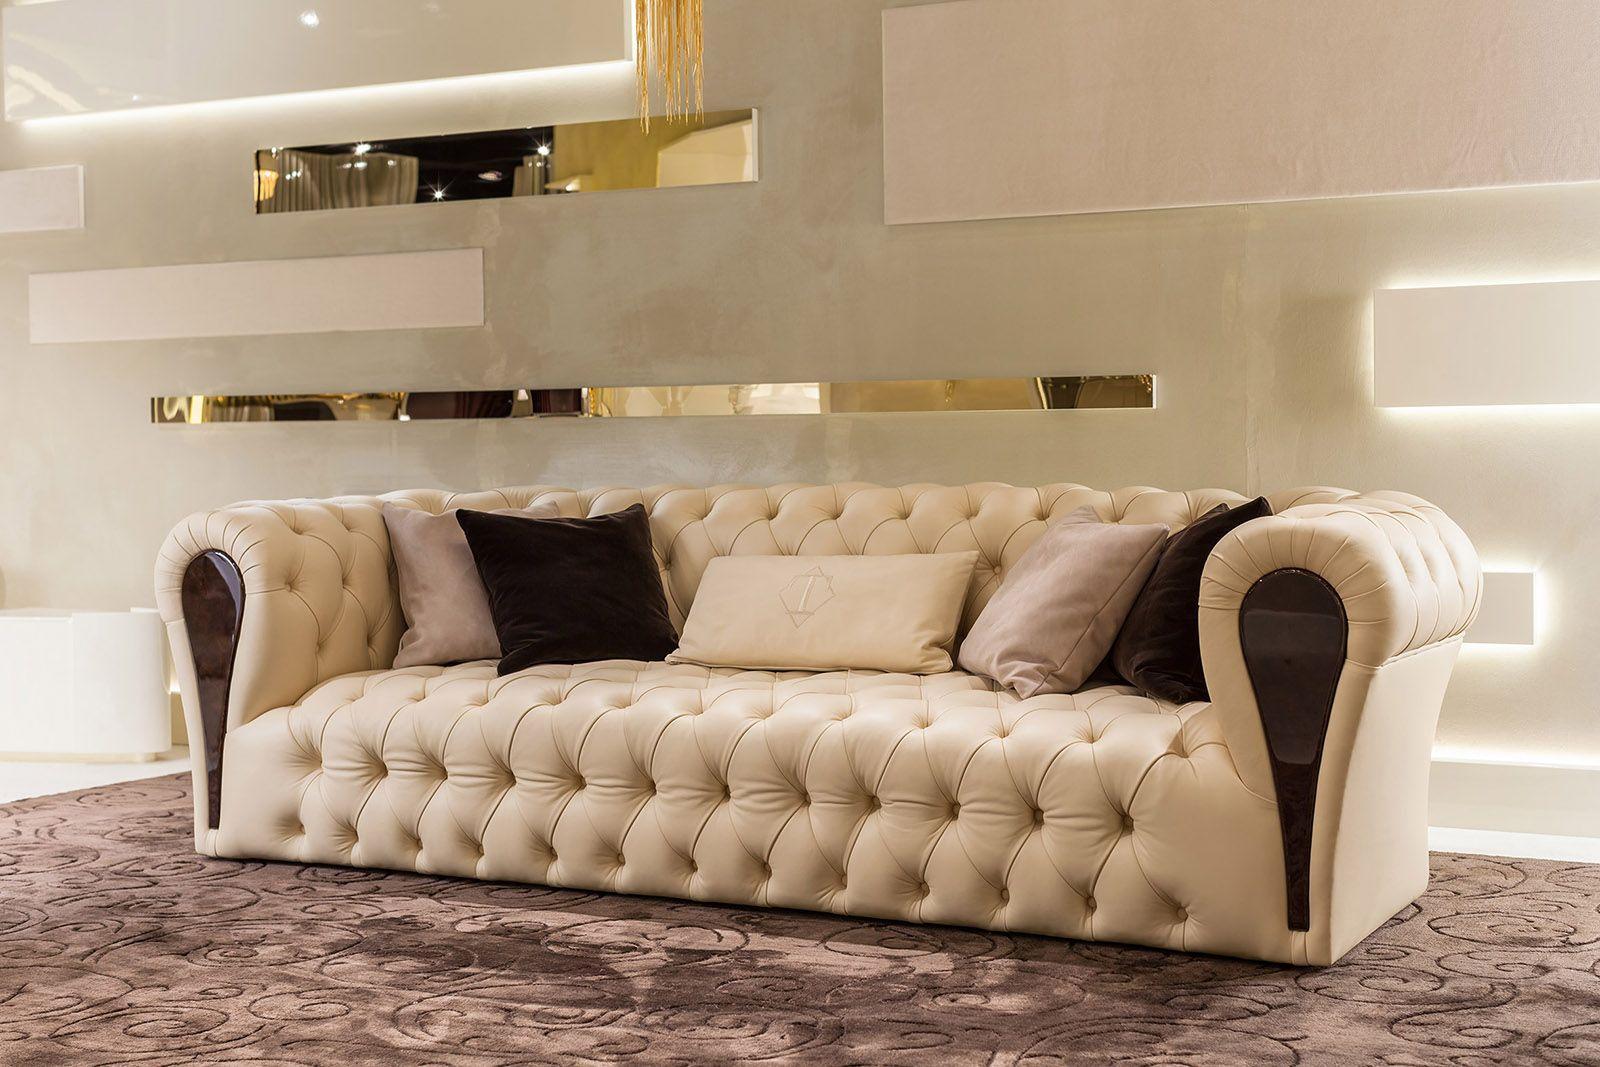 fancy sofa set design 18 inch doll for sale mayfair collection turri it luxury italian capitonné